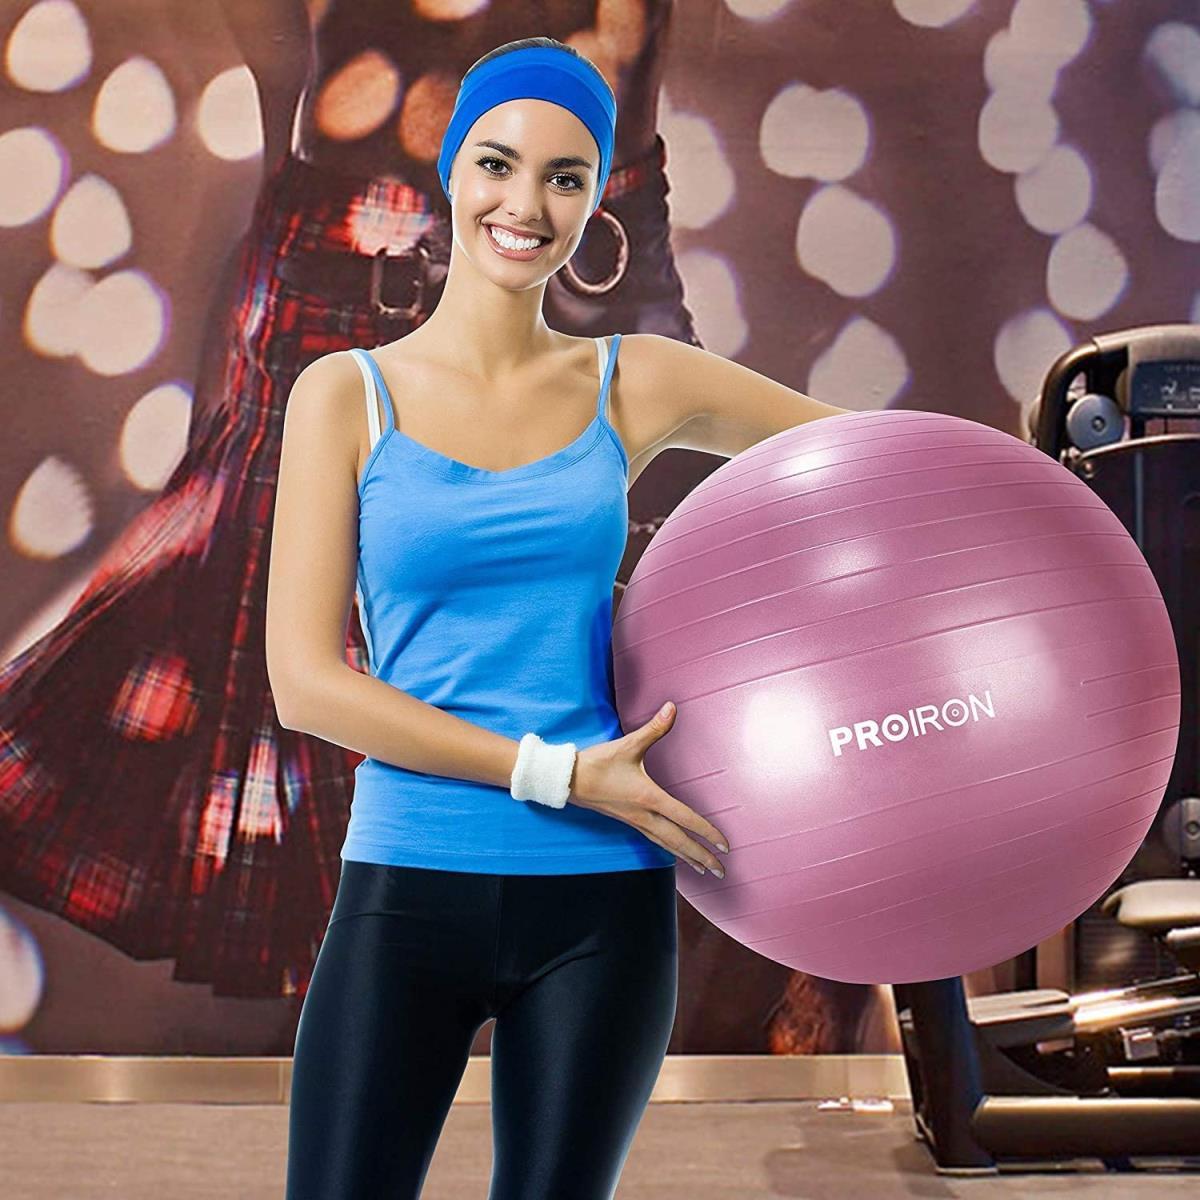 PROIRON Gymnastikball Ø75cm mit Pumpe Übung Yoga Balance Ball Pezziball Sitzball,PROIRON,PRO-YJ01-3, 6942590001149